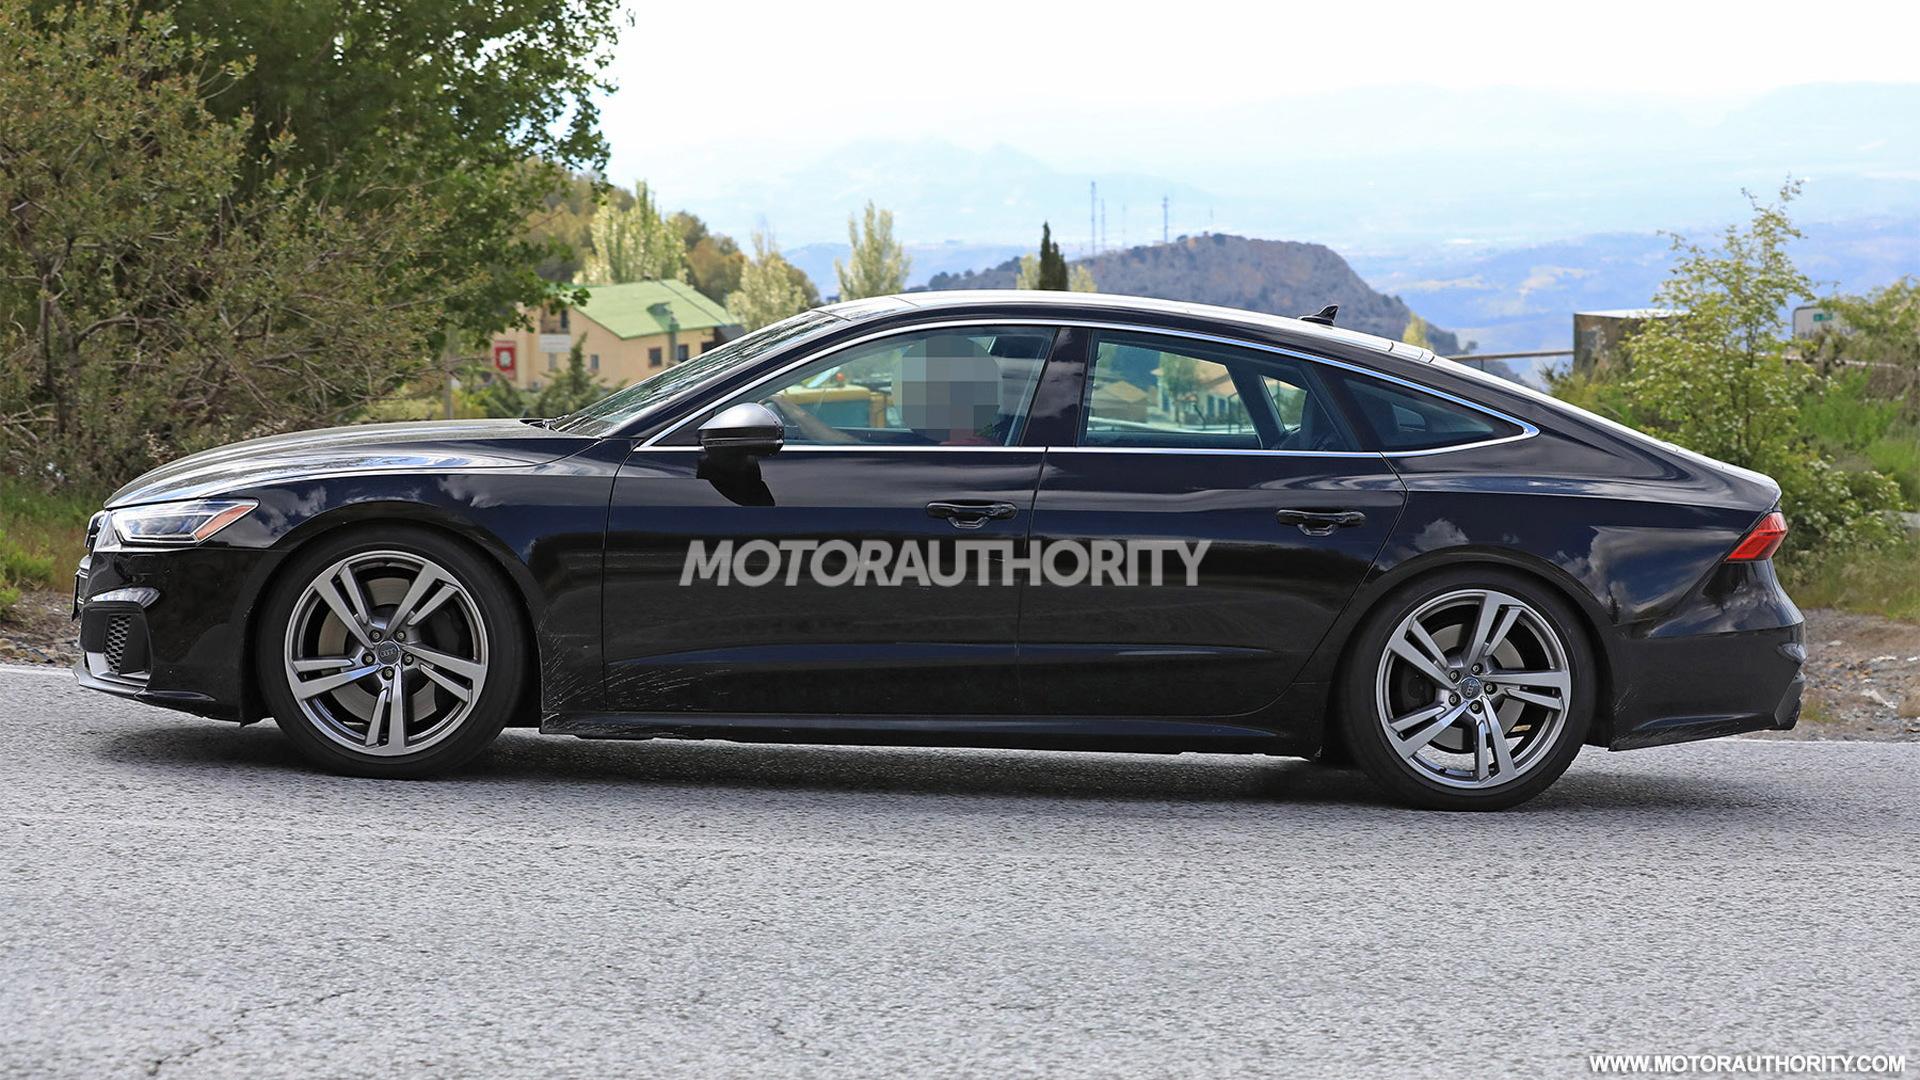 2019 Audi S7 spy shots - Image via S. Baldauf/SB-Medien